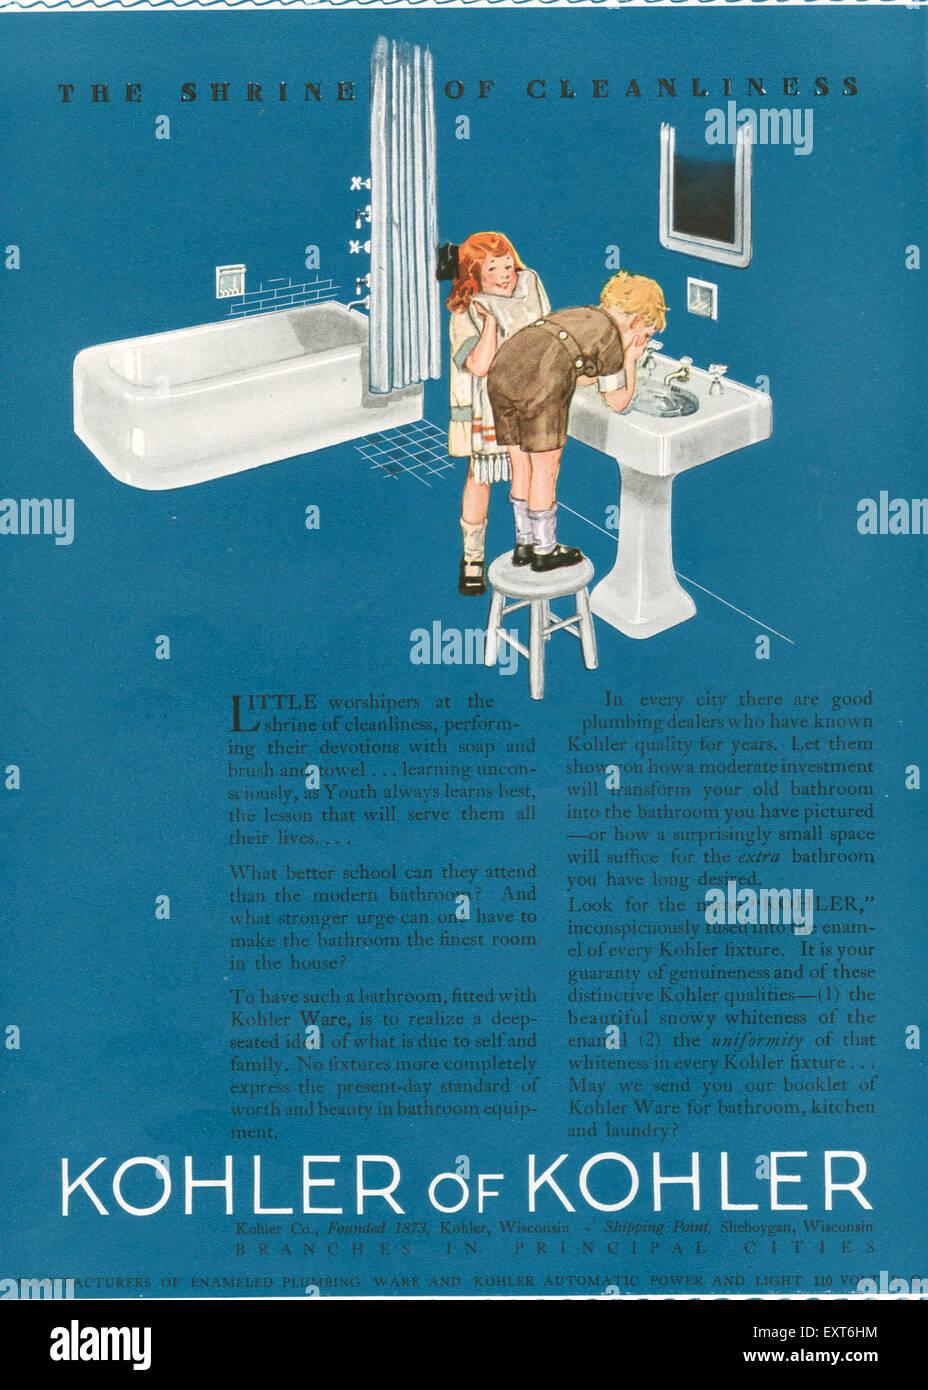 1920s USA Kohler Magazine Advert Stock Photo: 85354576 - Alamy